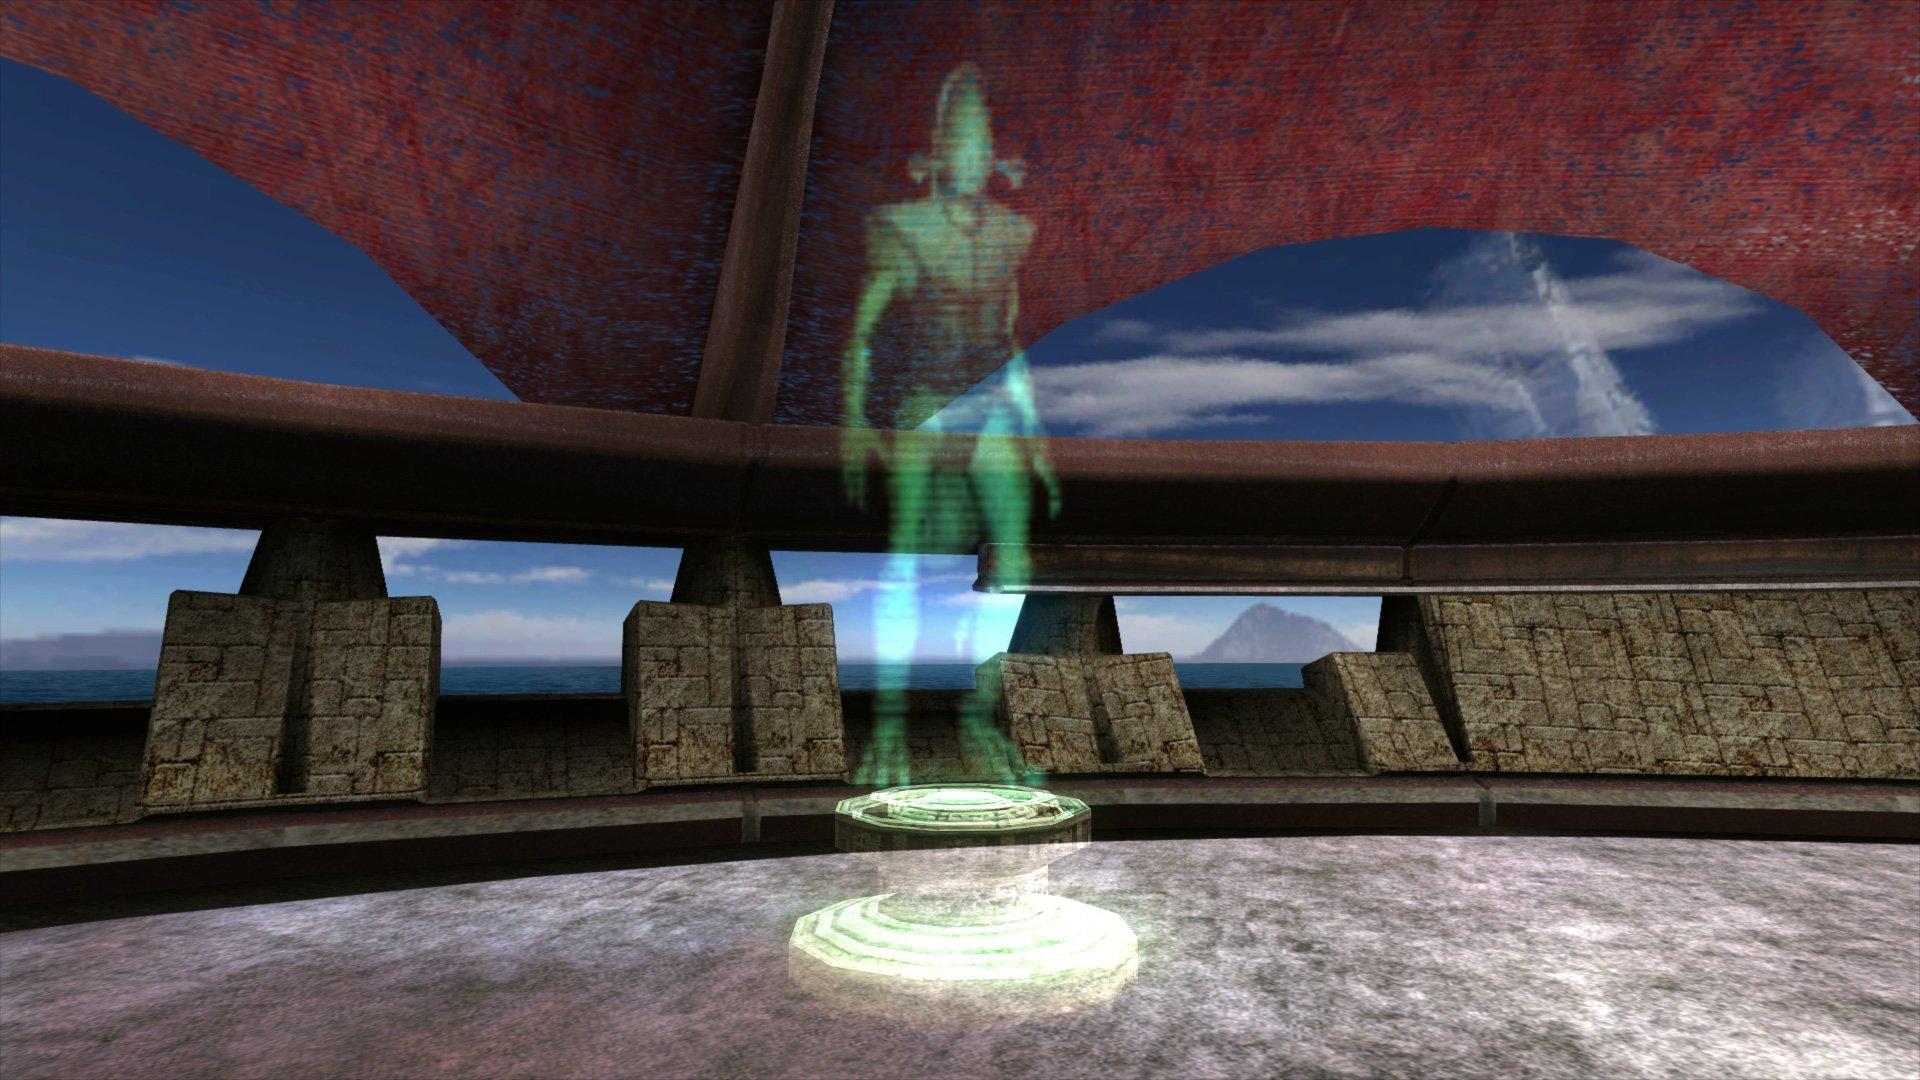 K1_Rakatan_Hologram_Statue_01.jpg